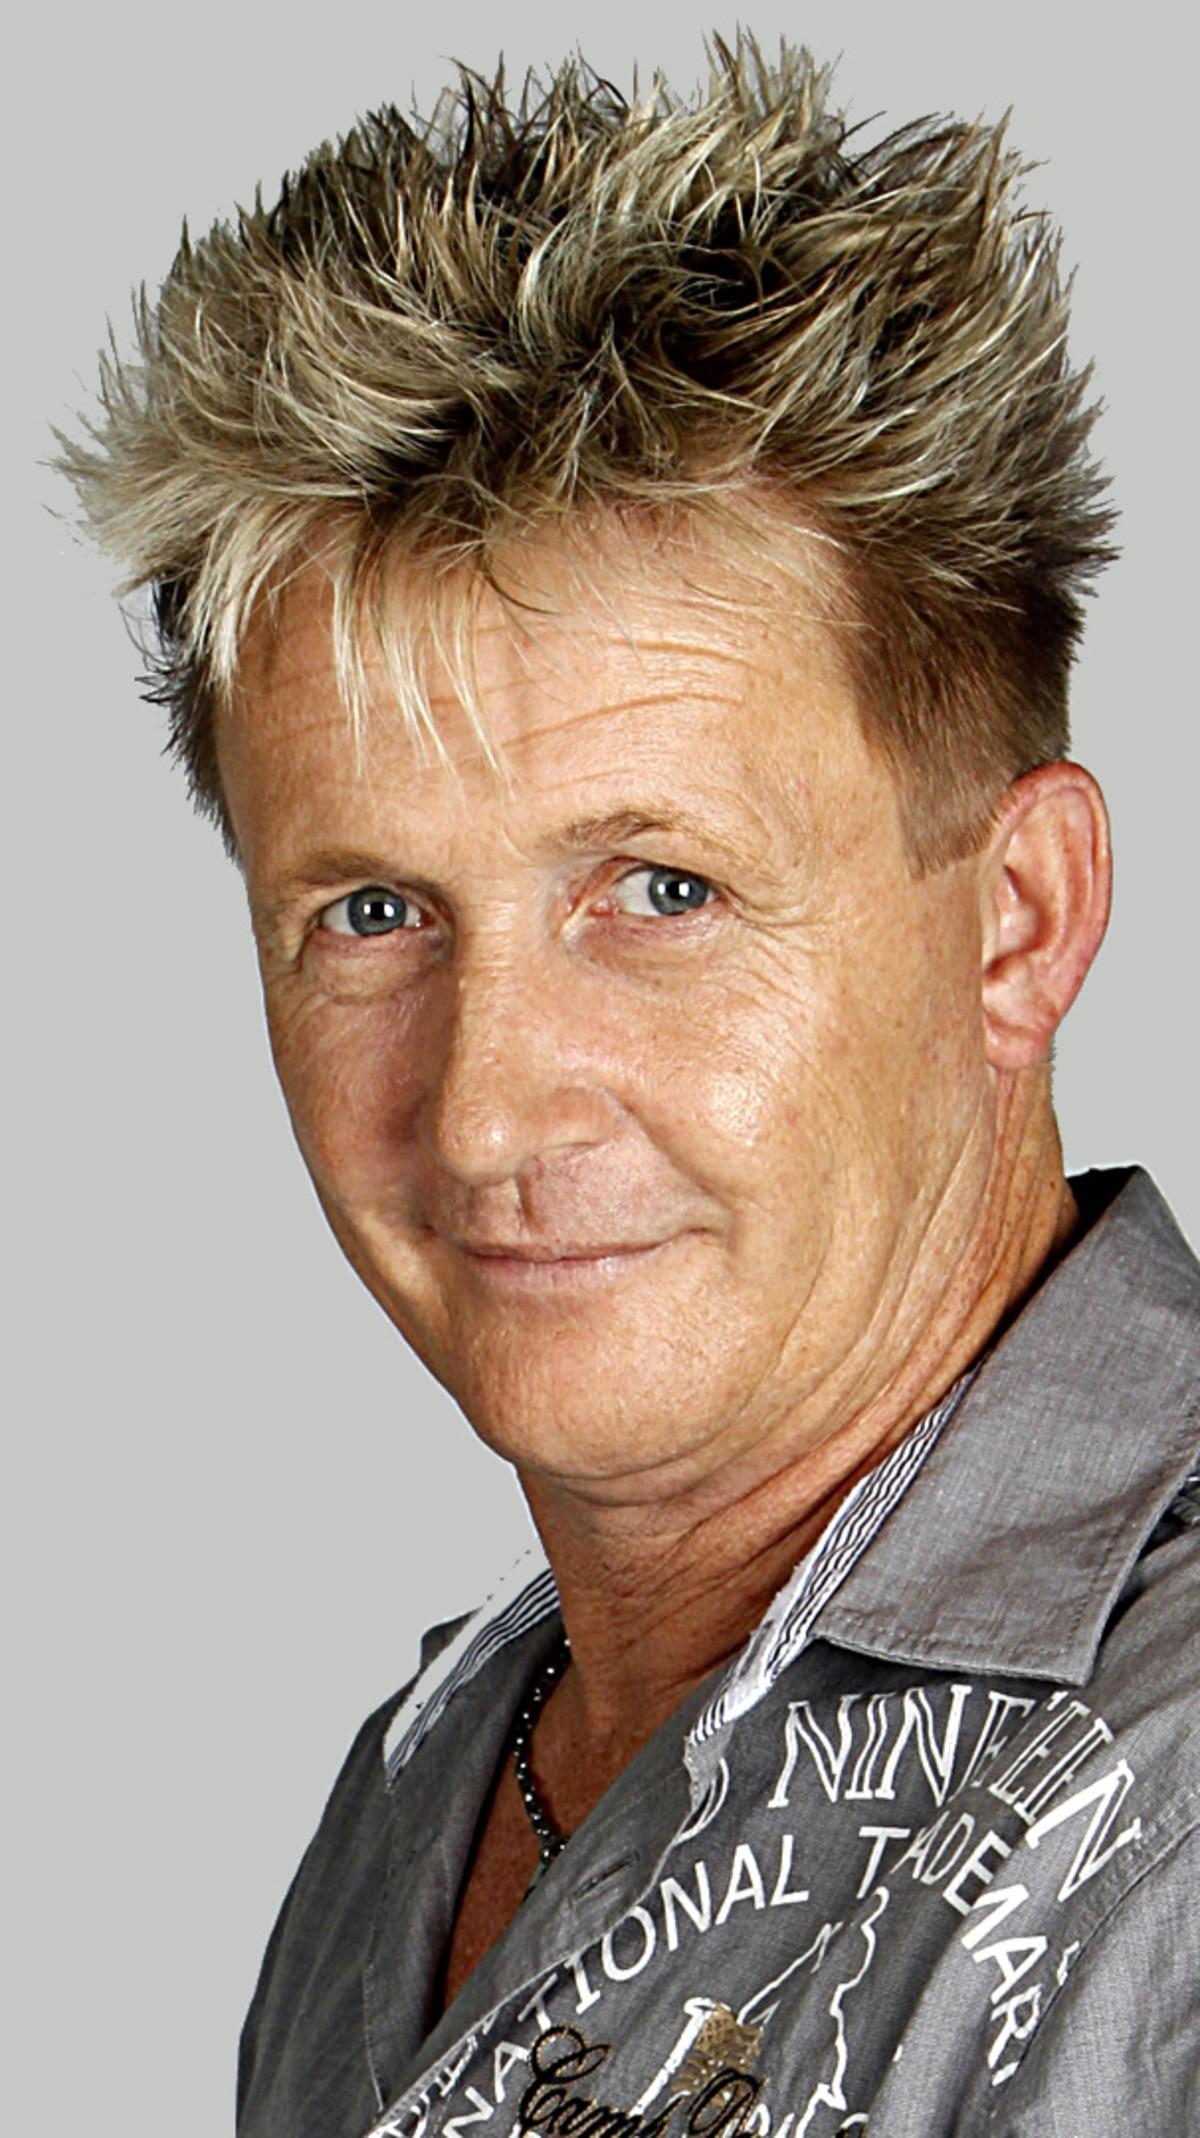 Stefan Wolloscheck